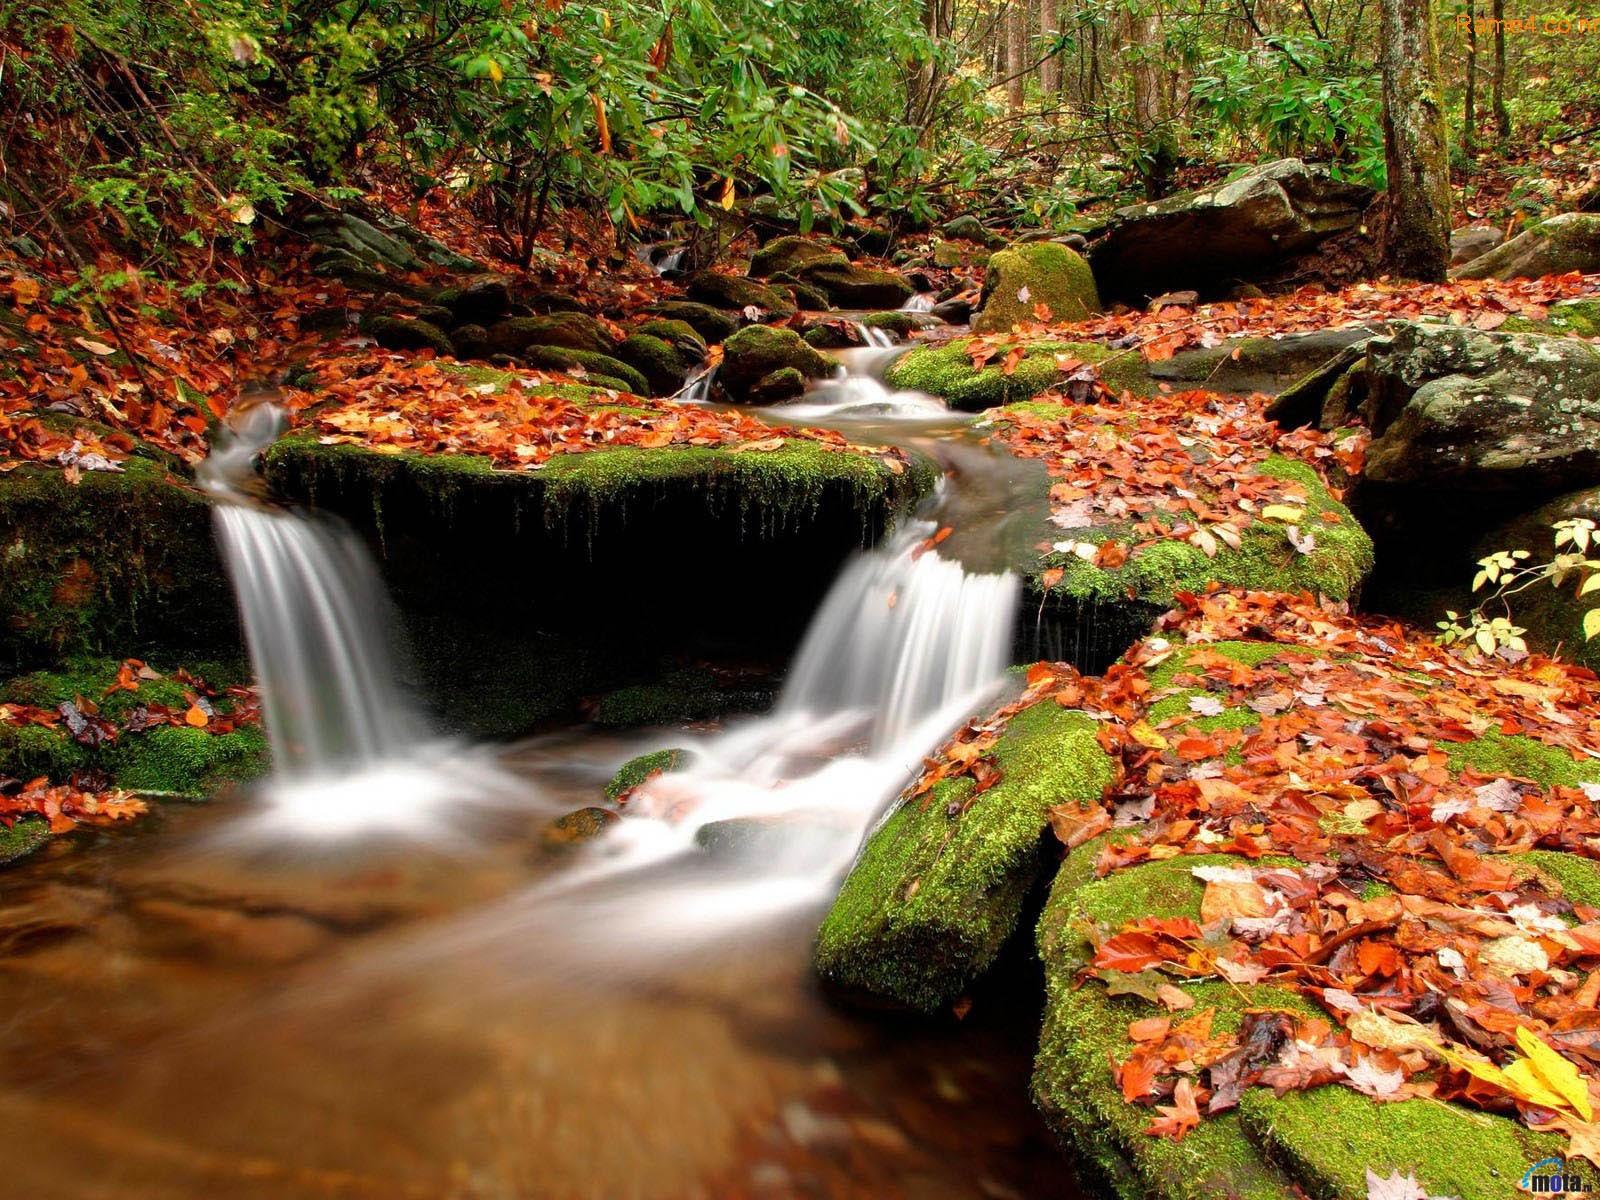 Amazing Nature Wallpaper HD For Desktop ZLLOX 1600x1200